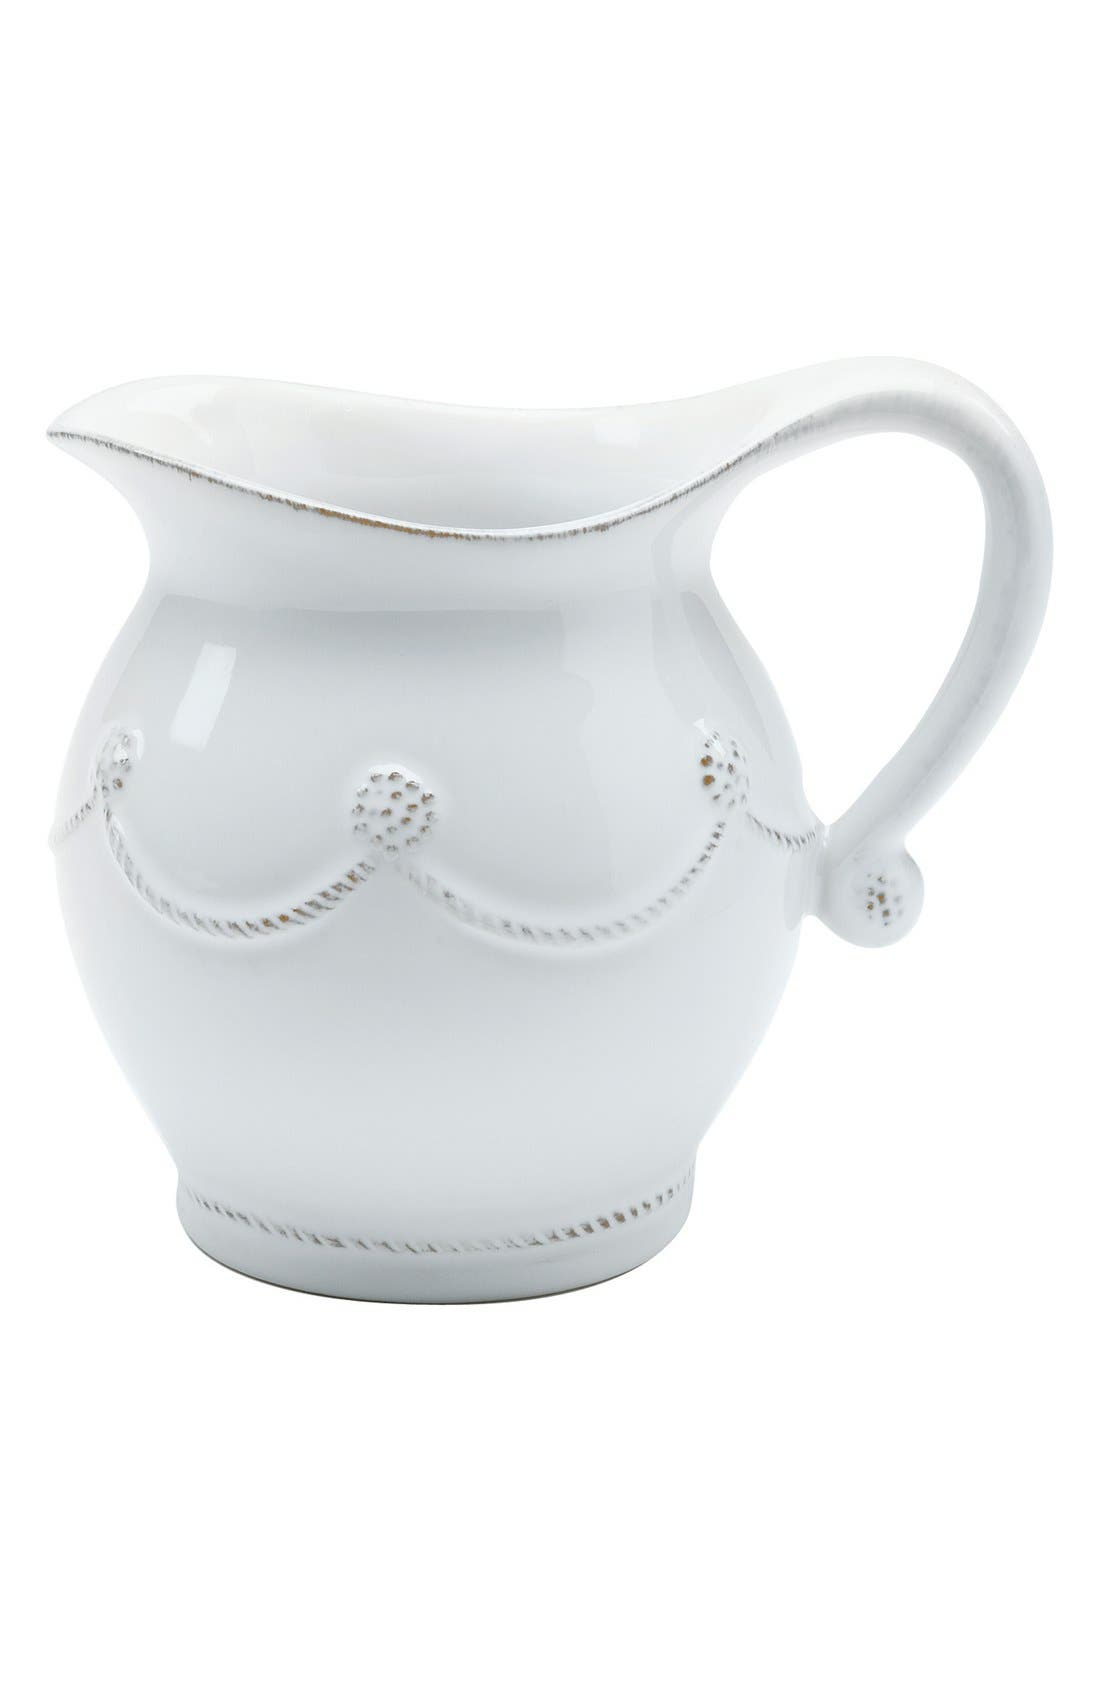 'Berry and Thread' Ceramic Creamer,                         Main,                         color, Whitewash